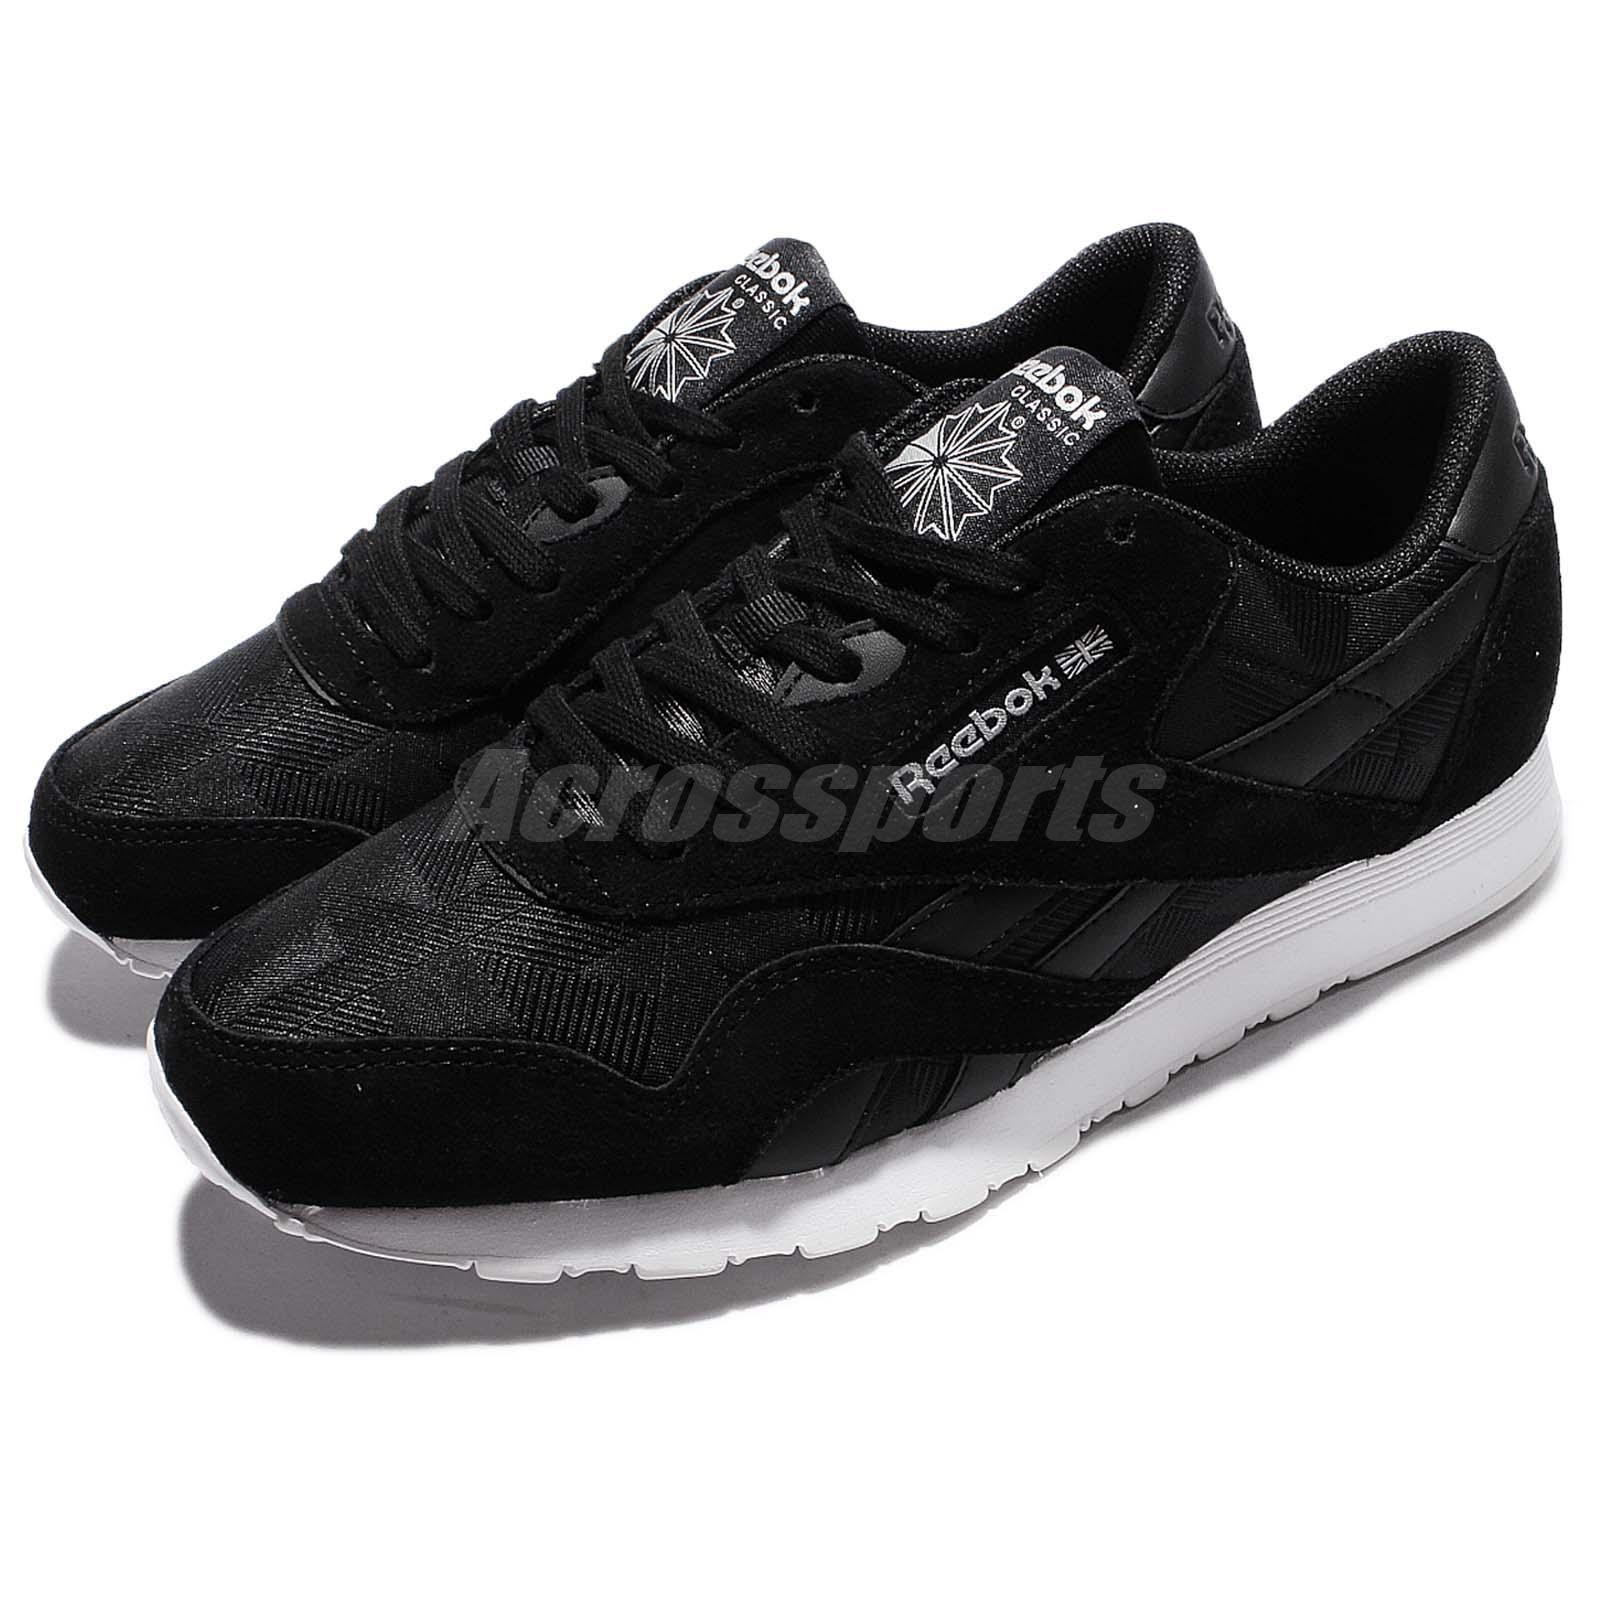 7dbbf84f606628 Details about Reebok CL Nylon Arch Black White Suede Men Classic Shoes  Retro Sneakers BD3077